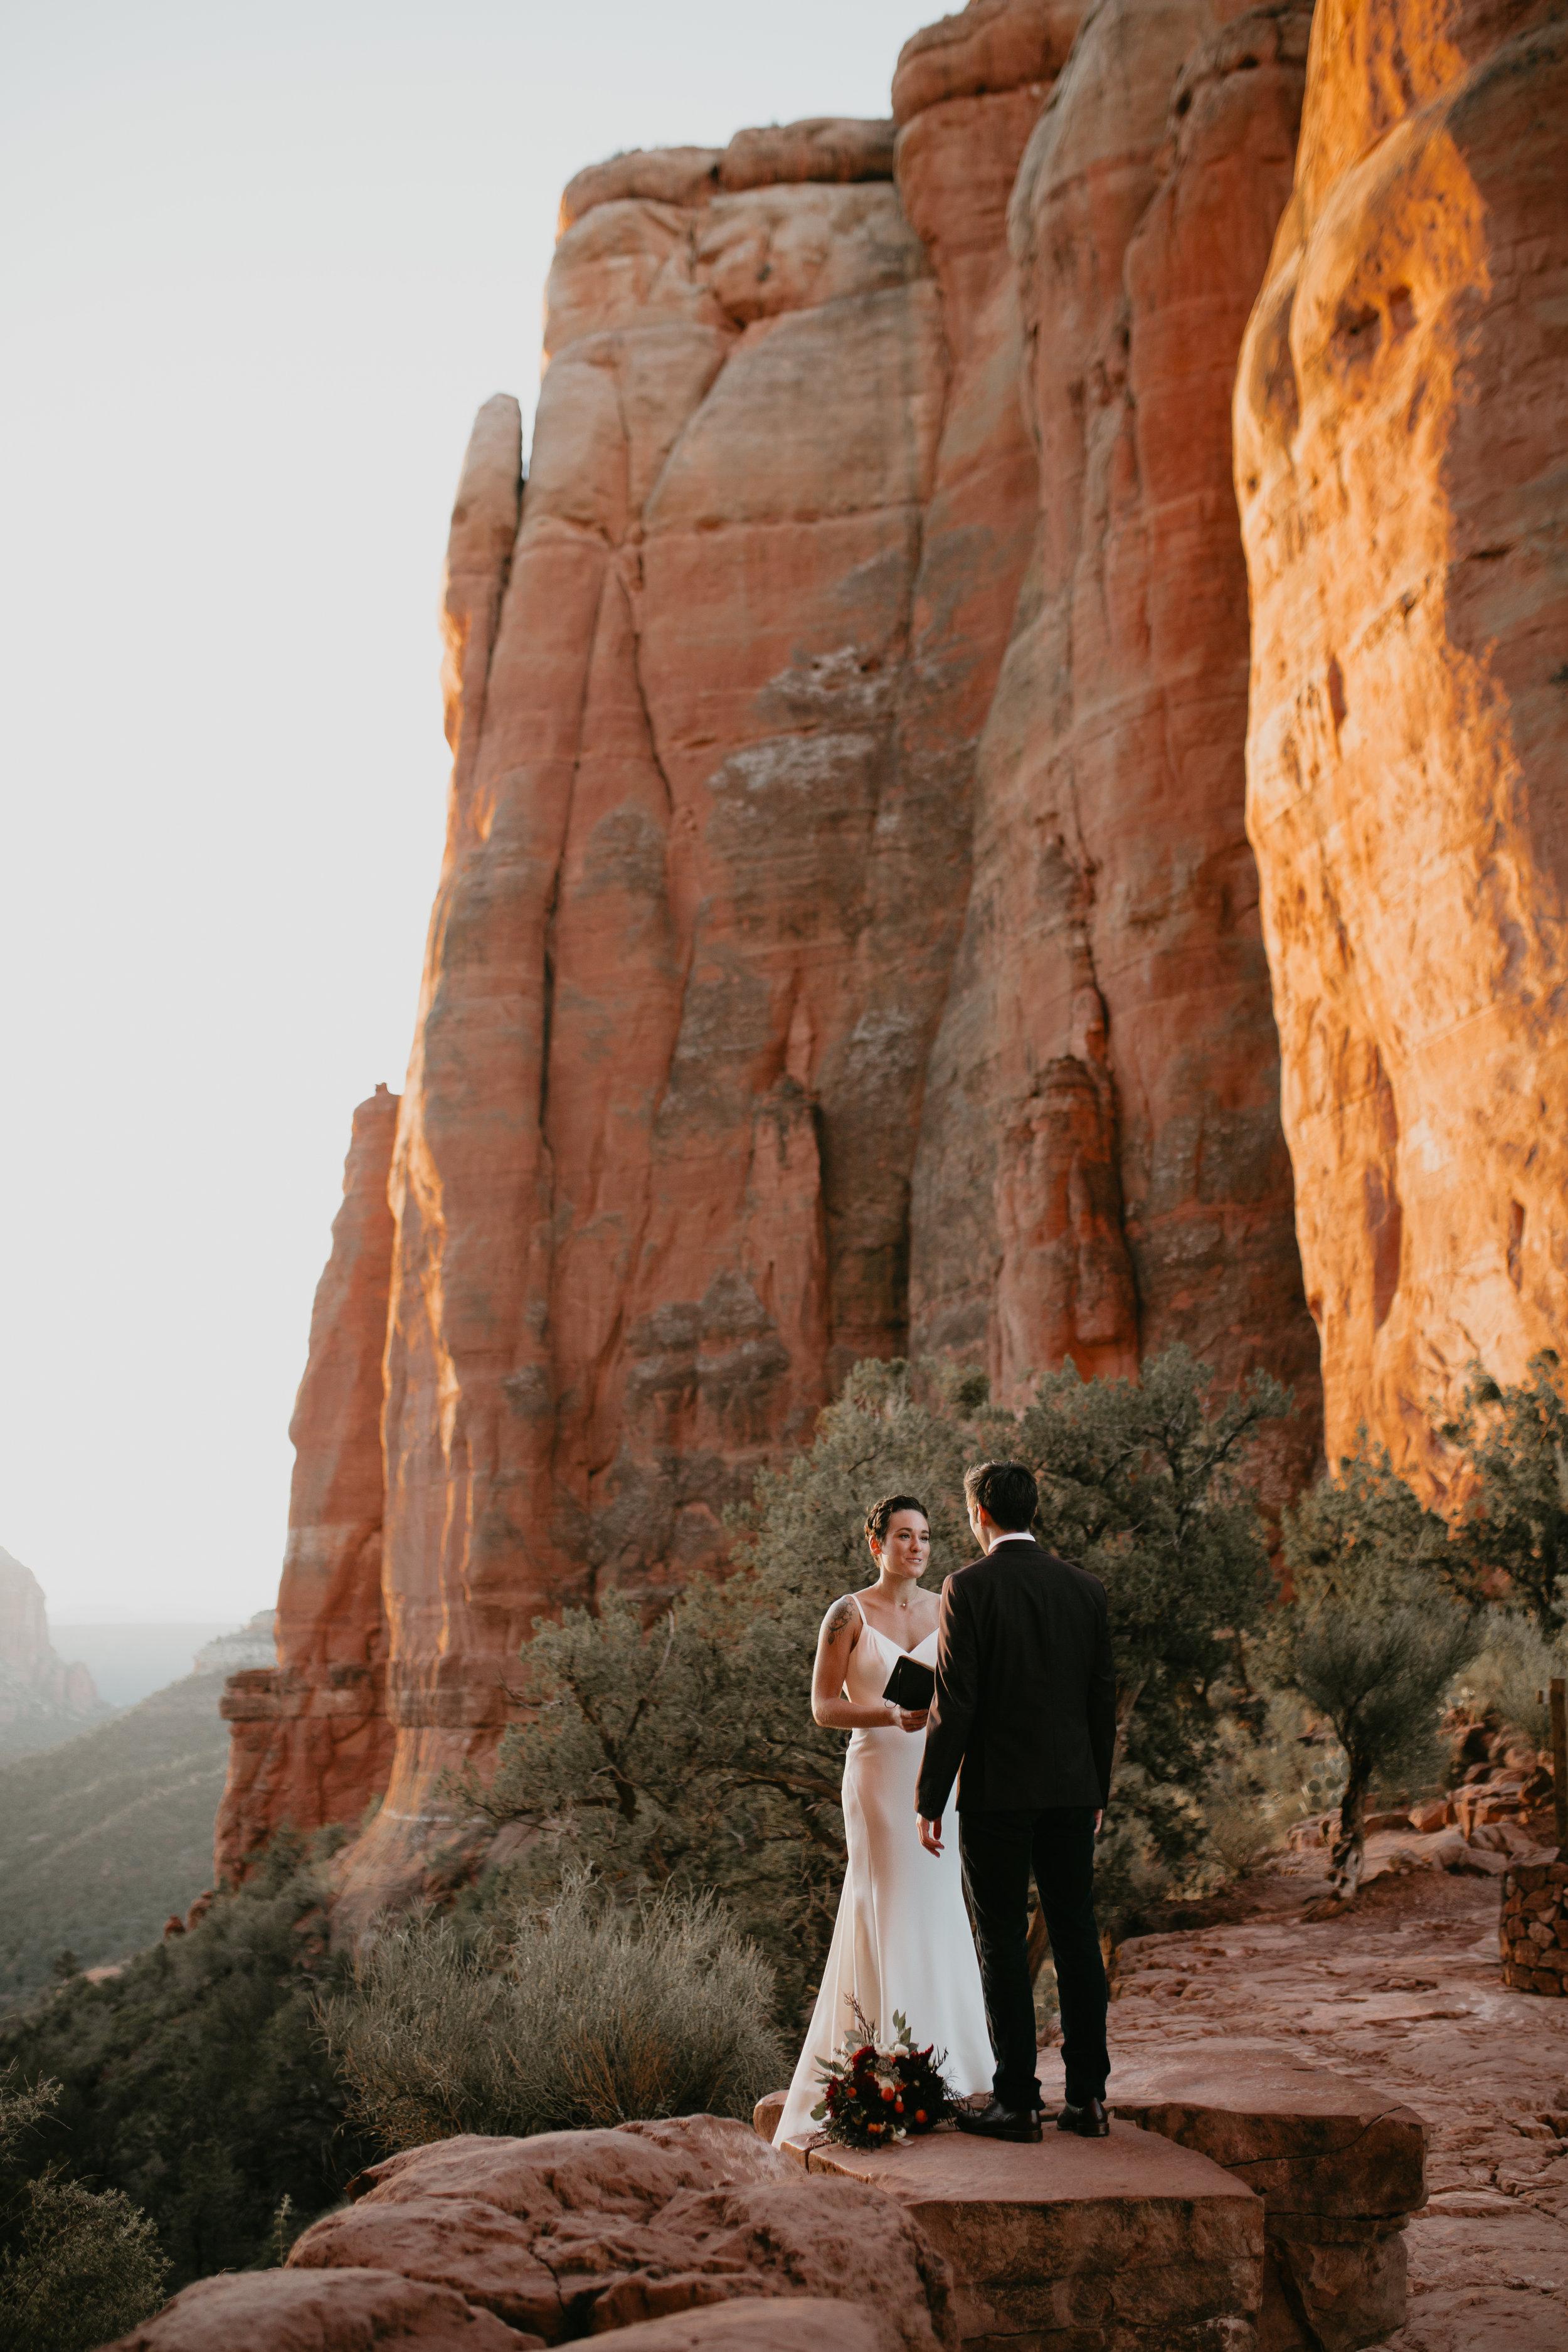 nicole-daacke-photography-sedona-arizona-destination-elopement-wedding-photographer-catherdral-rock-hiking-elopement-sedona-river-elopement-photos-desert-rock-wedding-photographer-laid-back-spontaneous-elopement-40.jpg